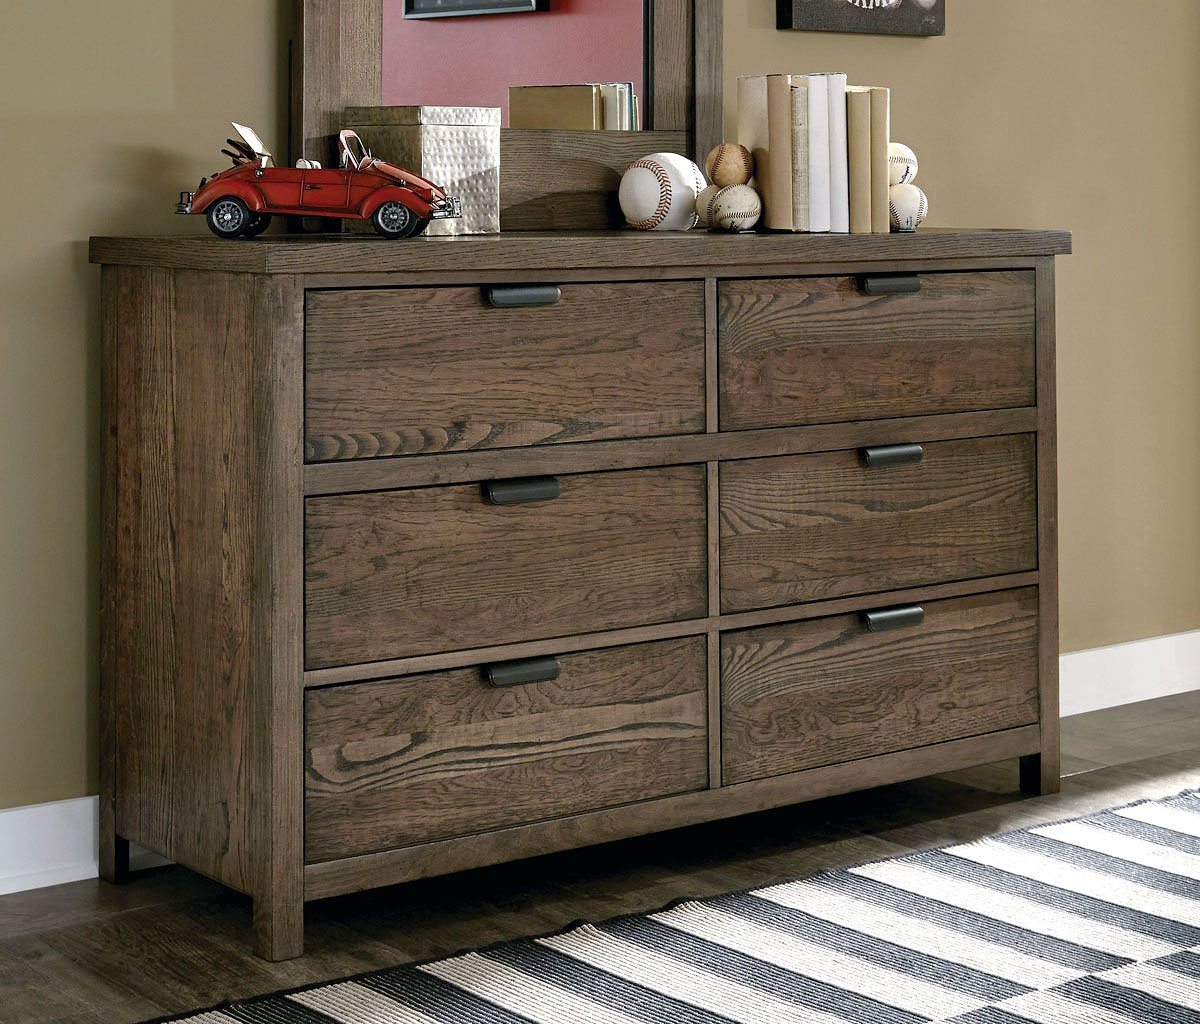 Fulton County 6 Drawer Dresser